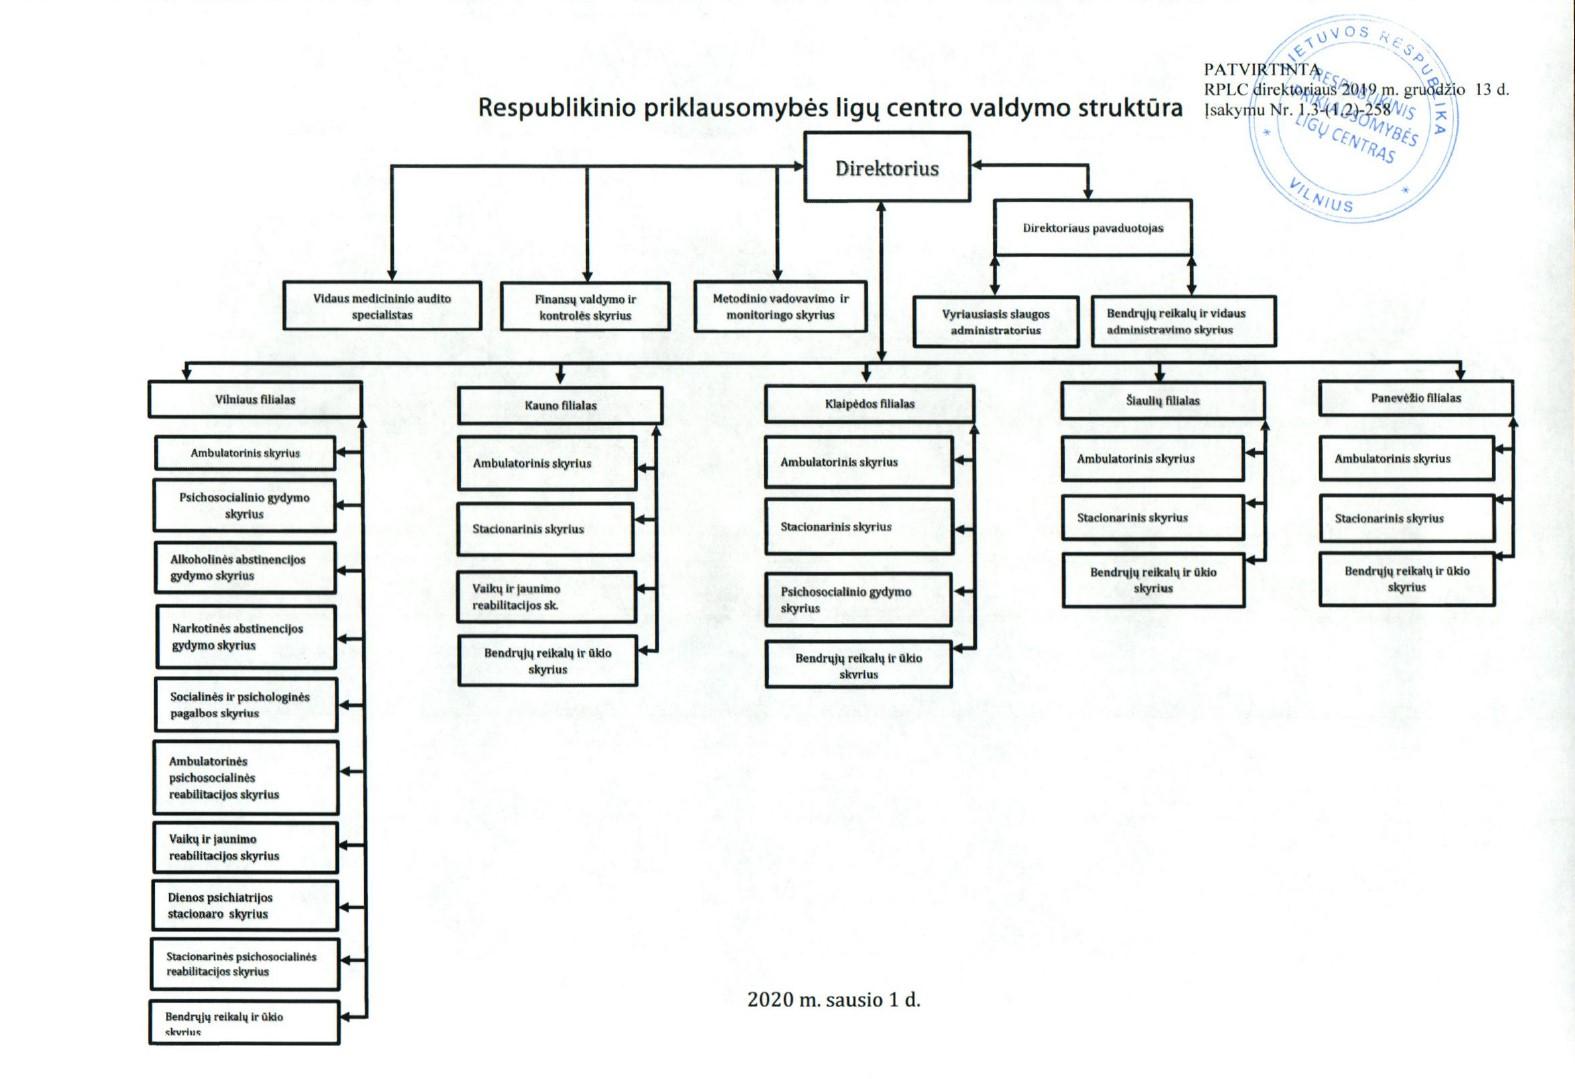 Centro valdymo struktūros vizuali schema